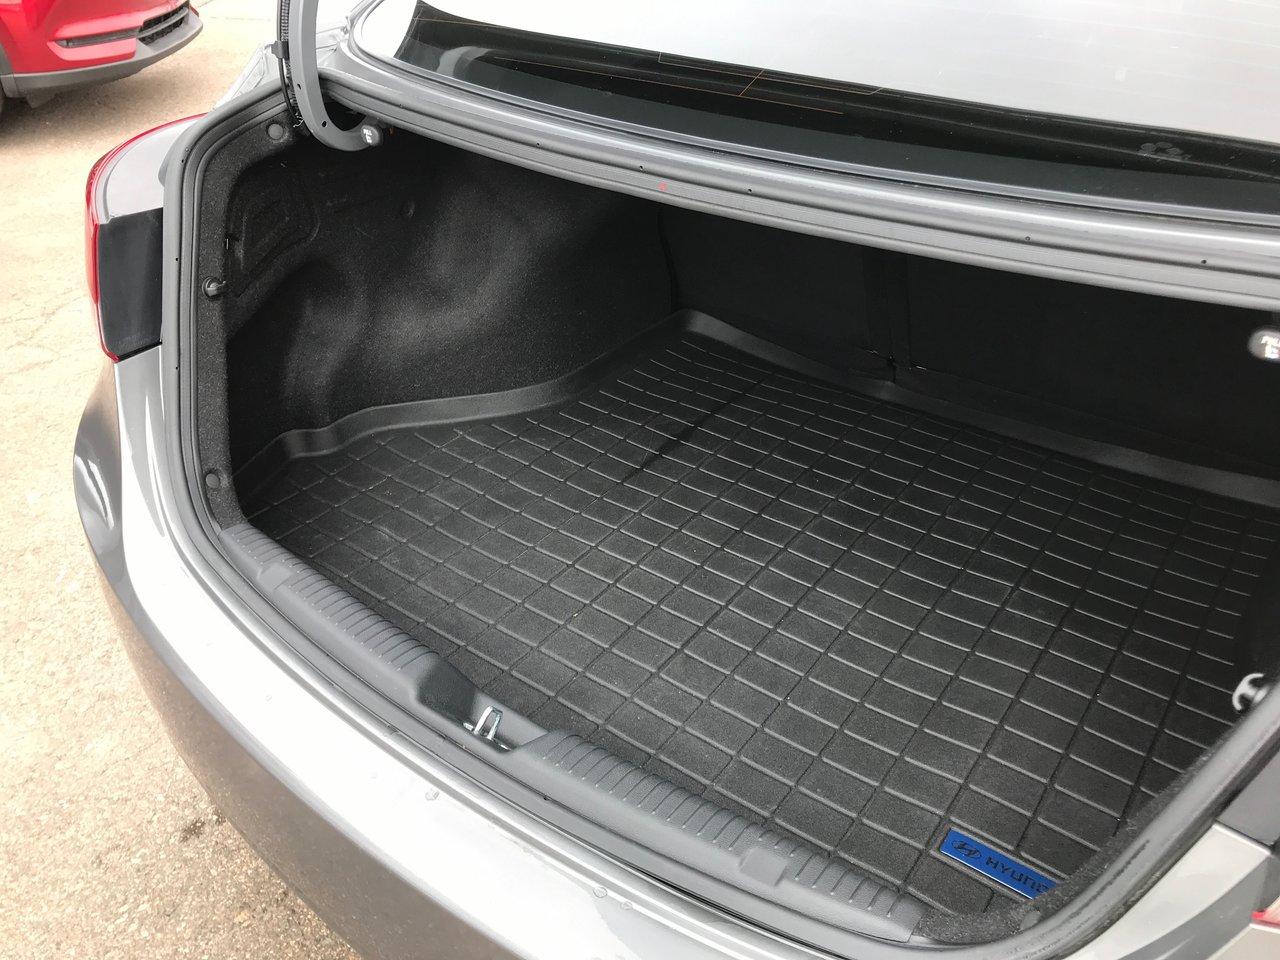 Photo 2013 Hyundai Elantra $99/BW TAX IN!!! LOW KMS! NEW TIRES! NEW BRAKES! $99/BW TAX IN!!! LOW KMS! NEW TIRES! NEW BRAKES!